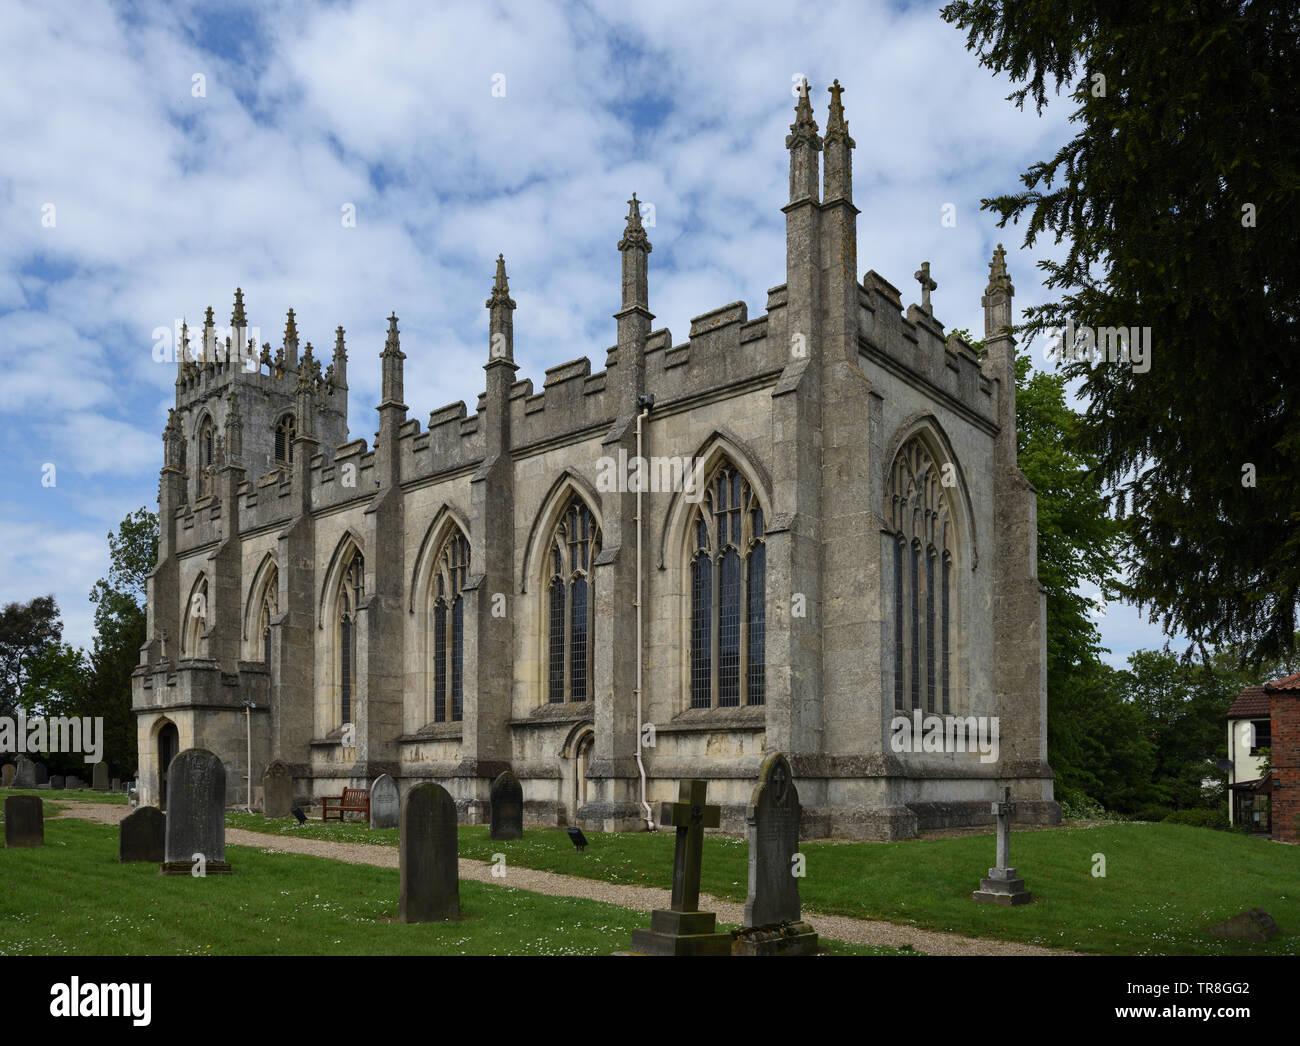 La Iglesia de San Agustín, Skirlaugh, East Yorkshire, Inglaterra Foto de stock